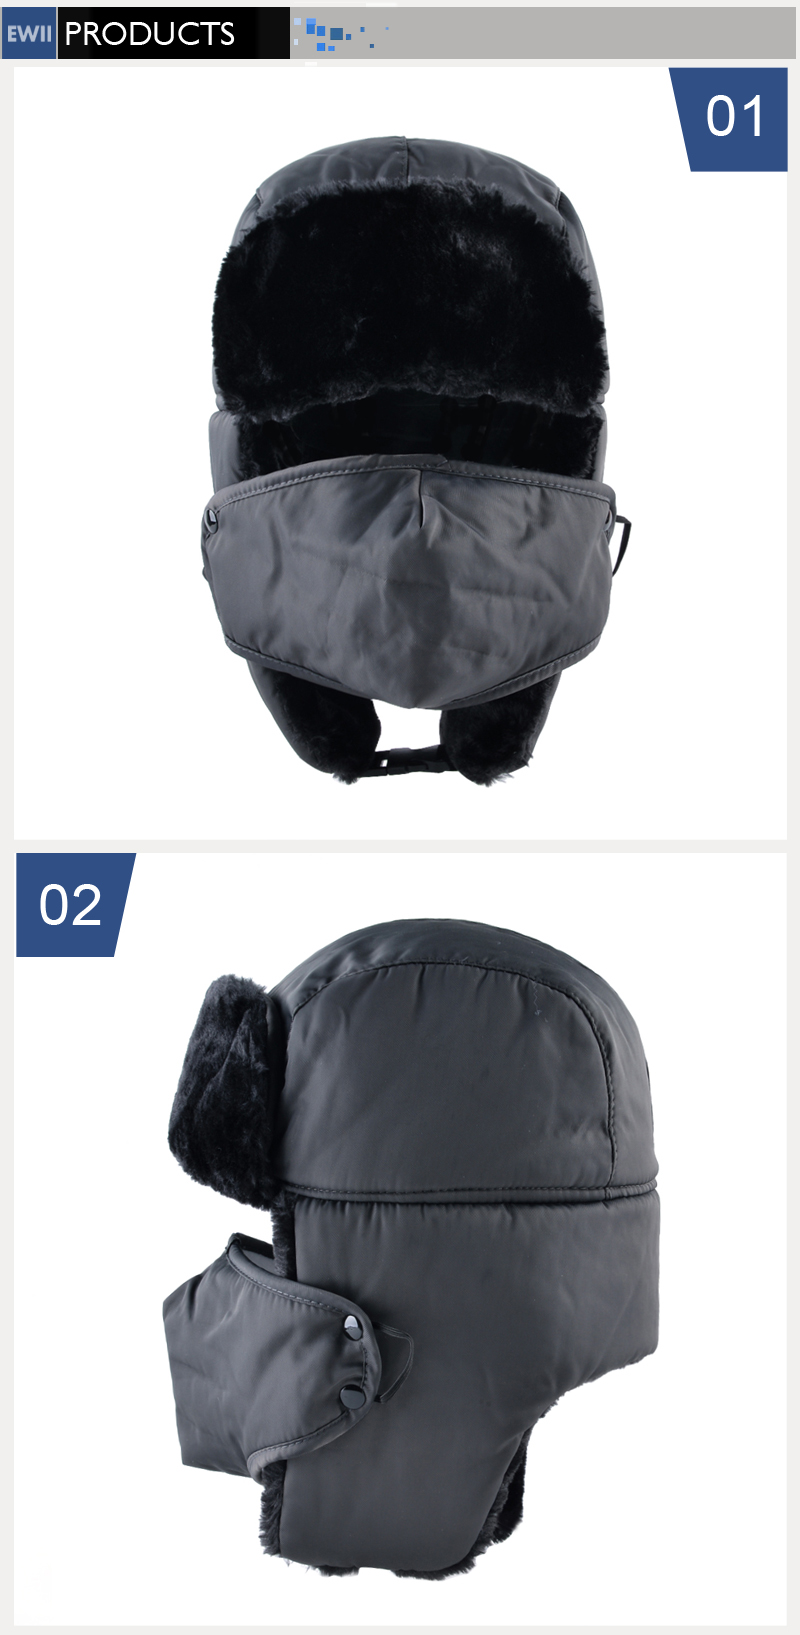 Chapeau bombardier